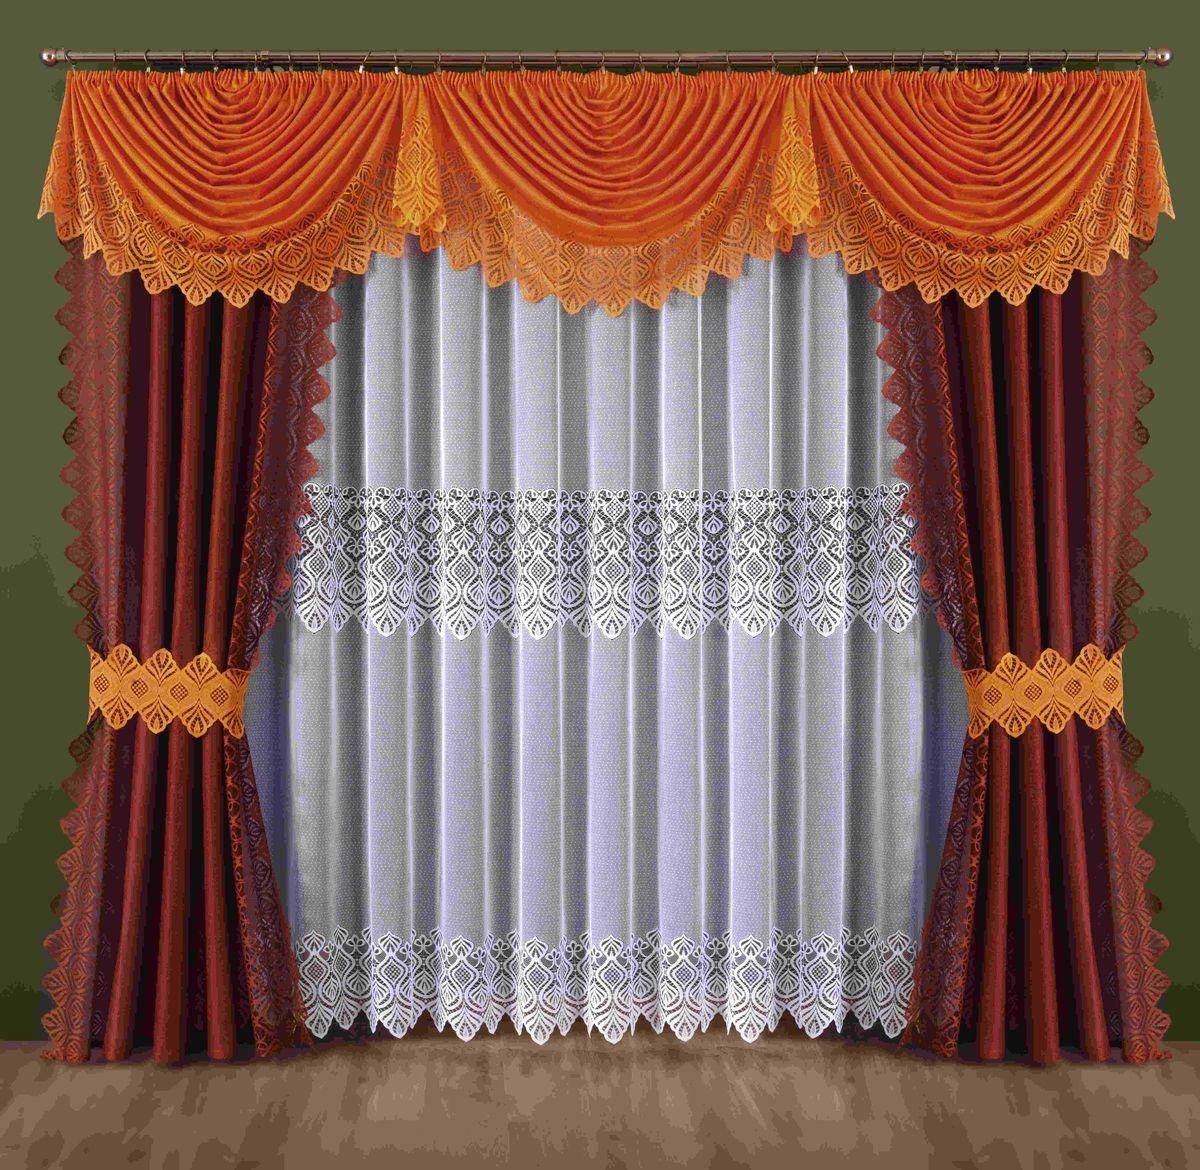 Комплект штор Wisan Mira, на ленте, цвет: оранжевый, бордовый, высота 250 см комплект штор wisan lara на ленте цвет оранжевый белый высота 250 см